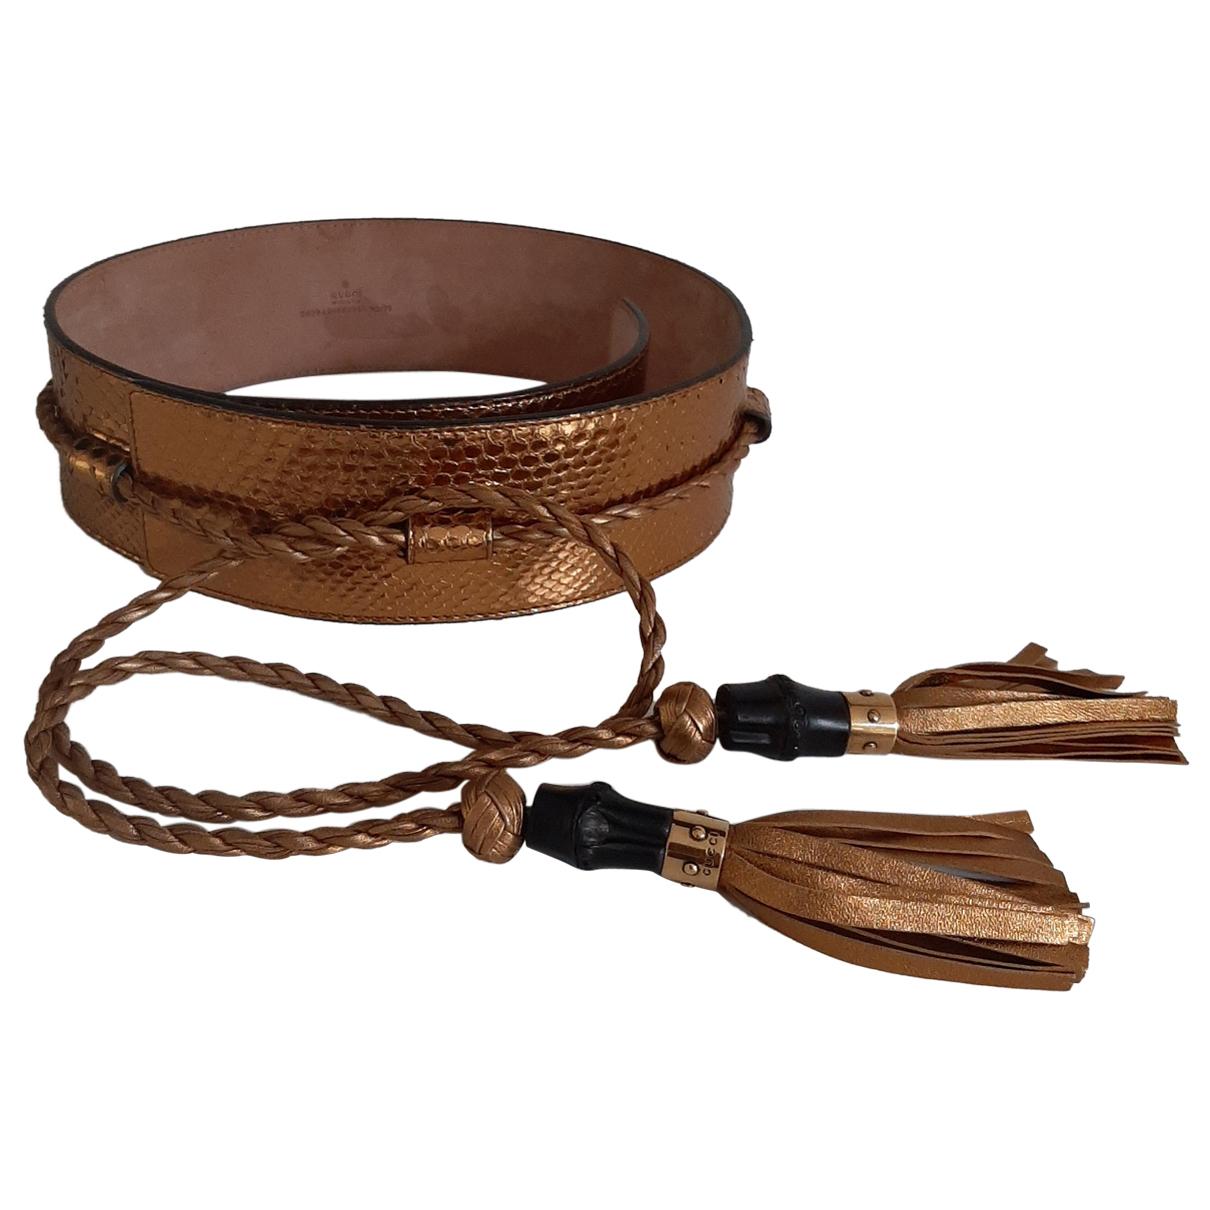 Cinturon de Piton Gucci